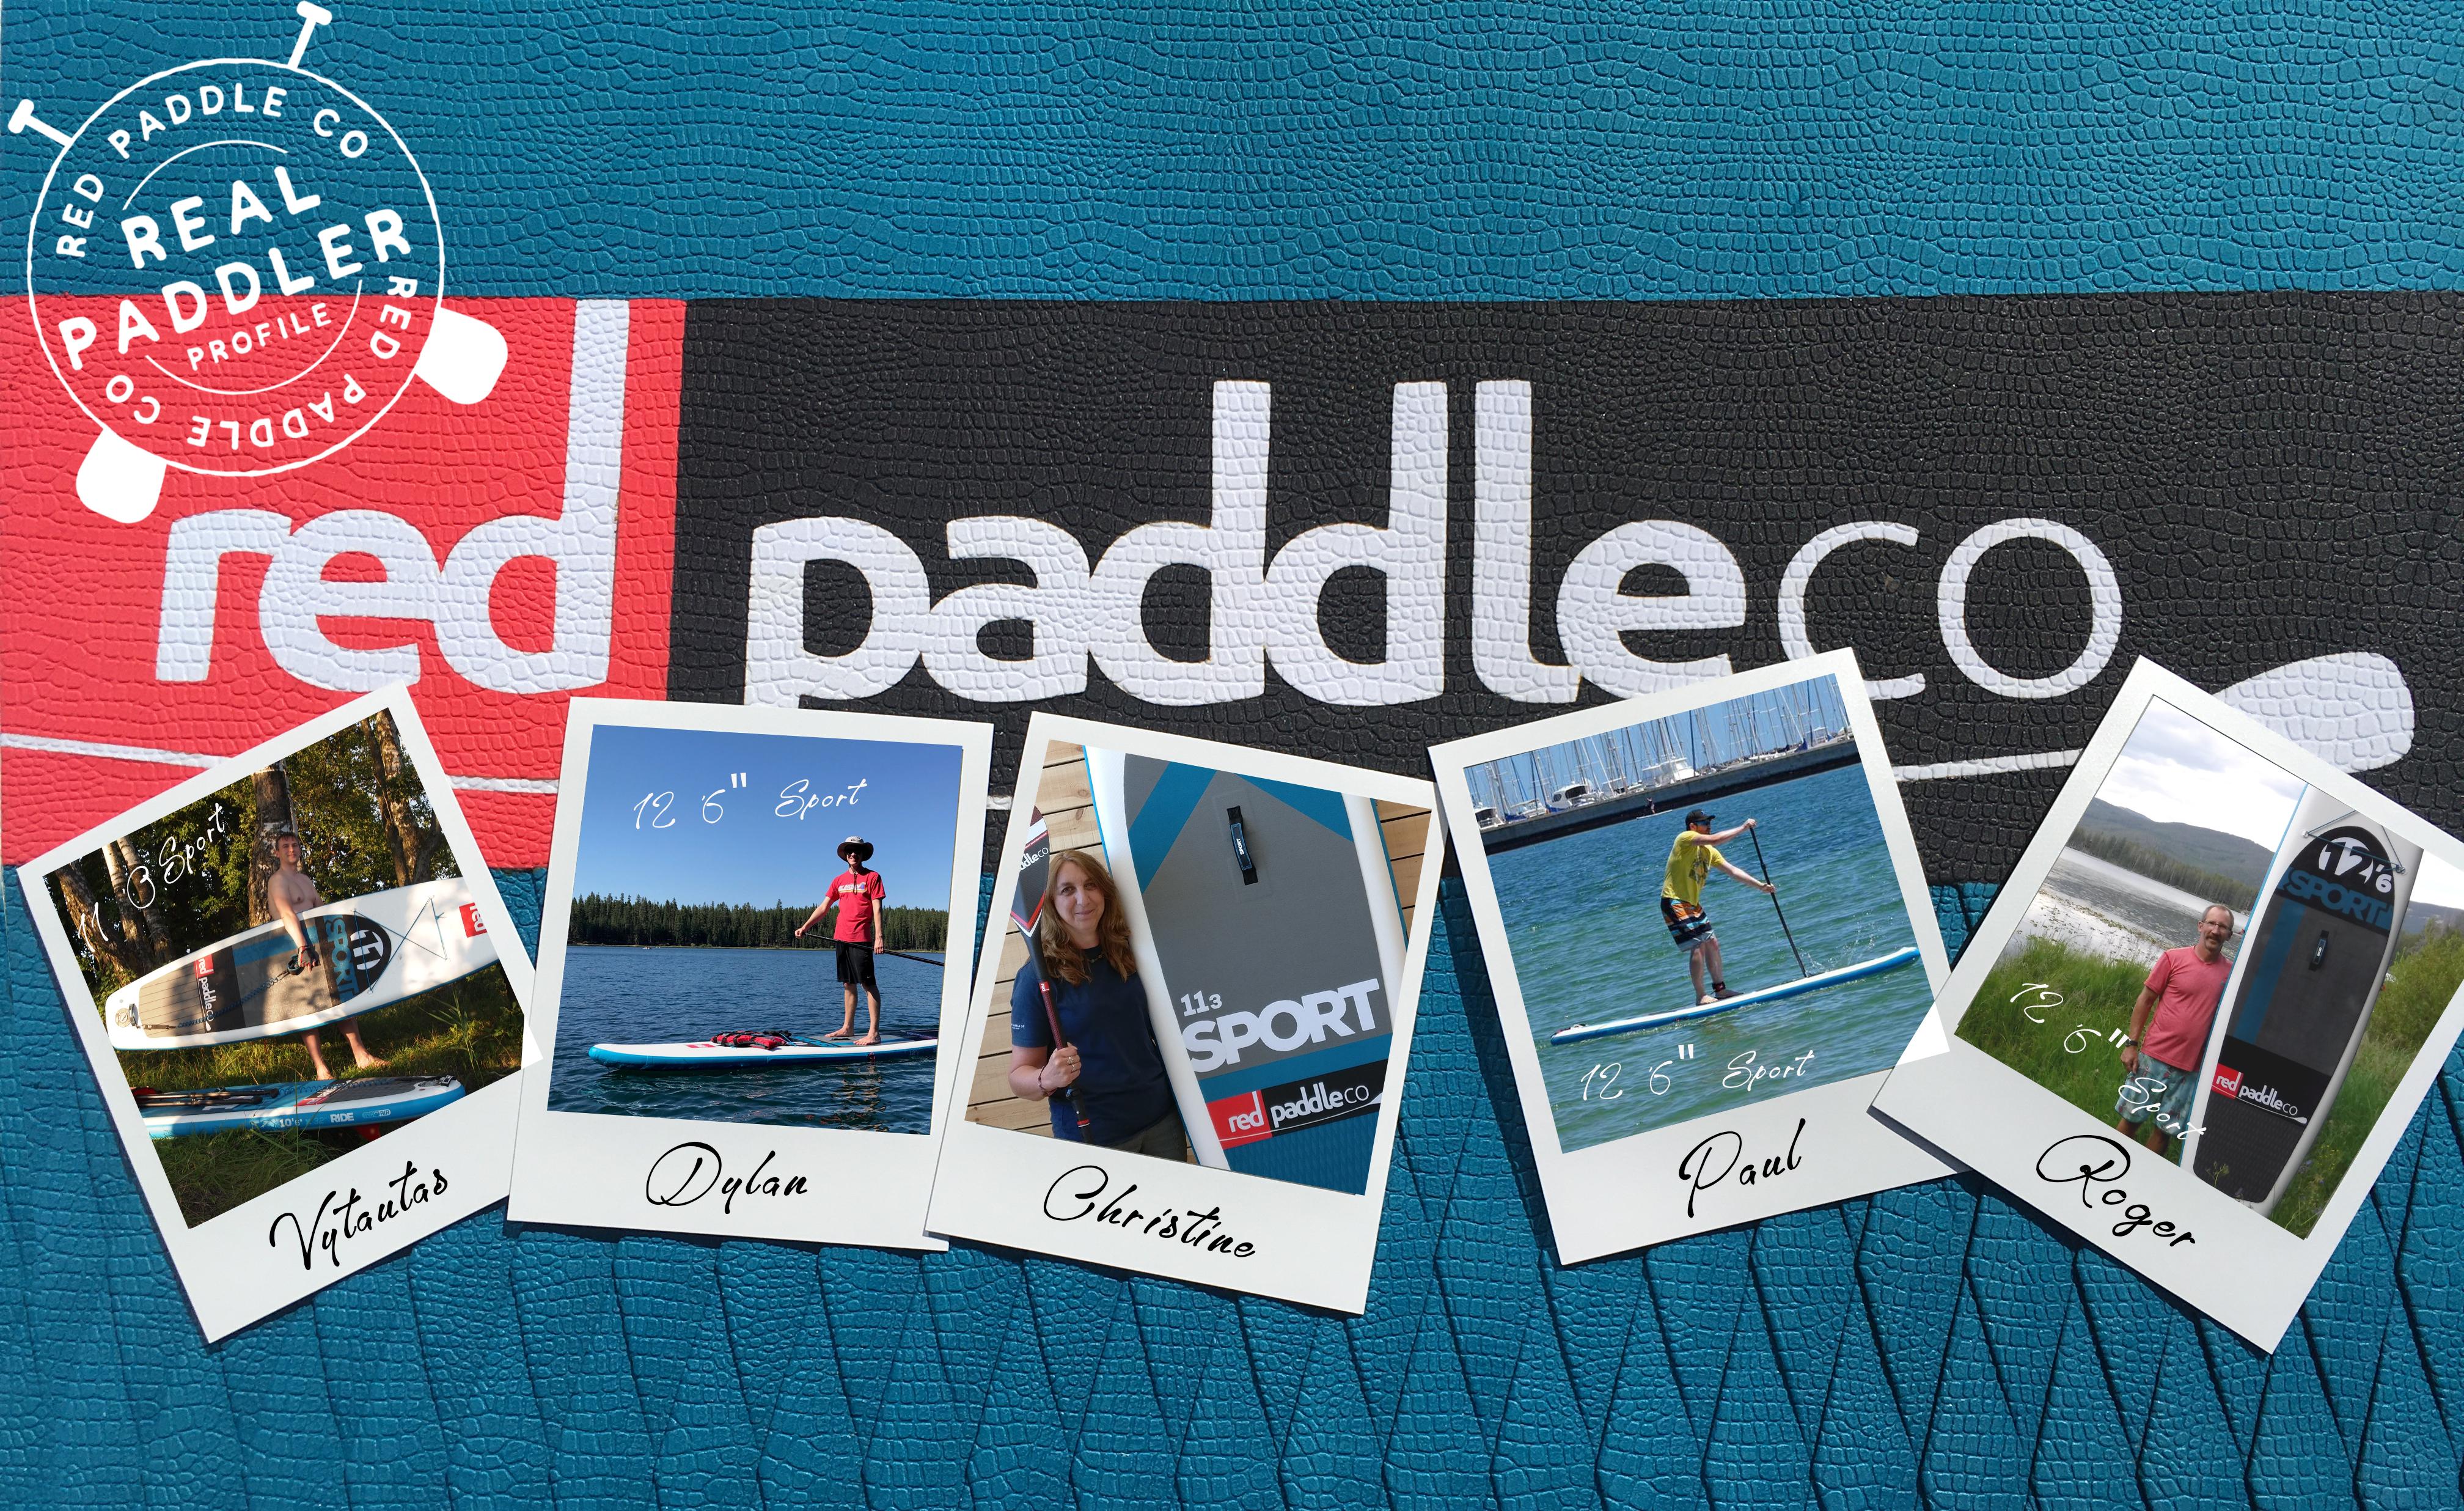 Sport paddle board profiles